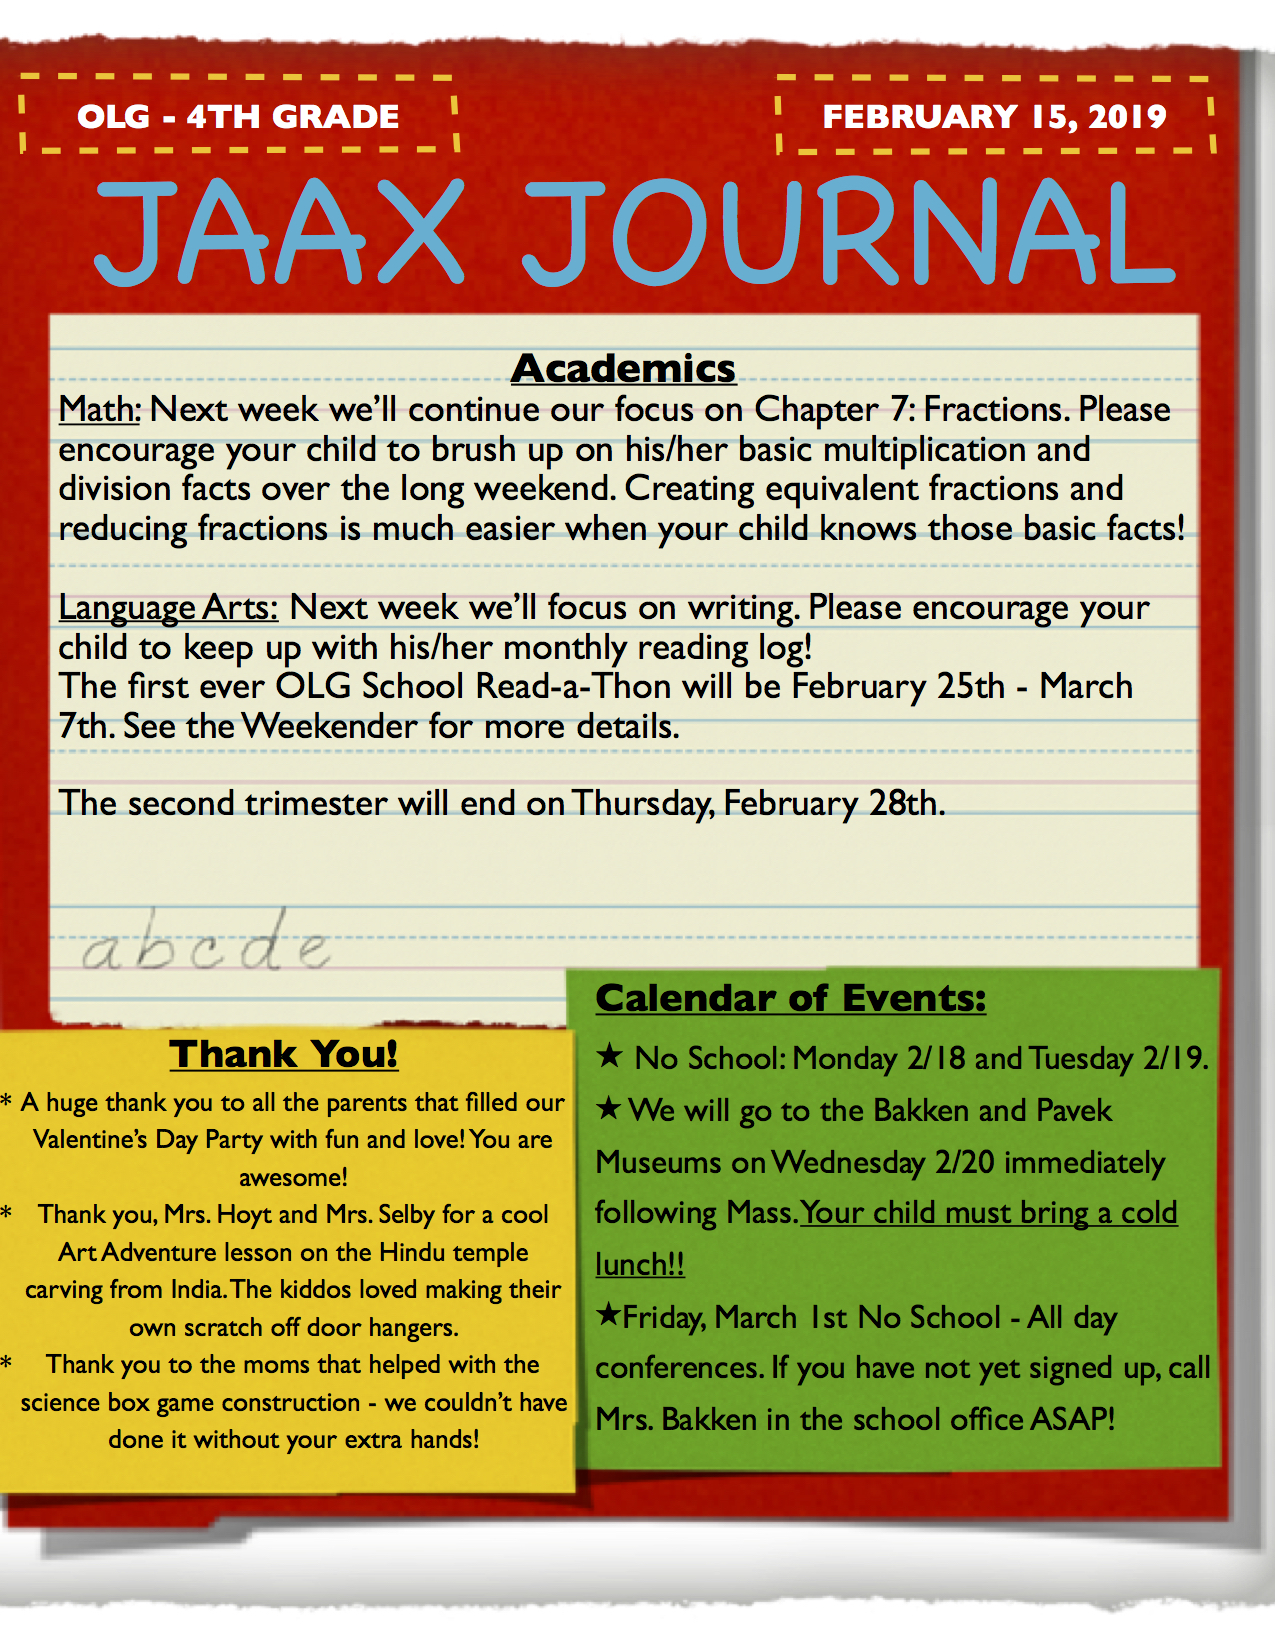 JaaxJournal2-15-19.jpg